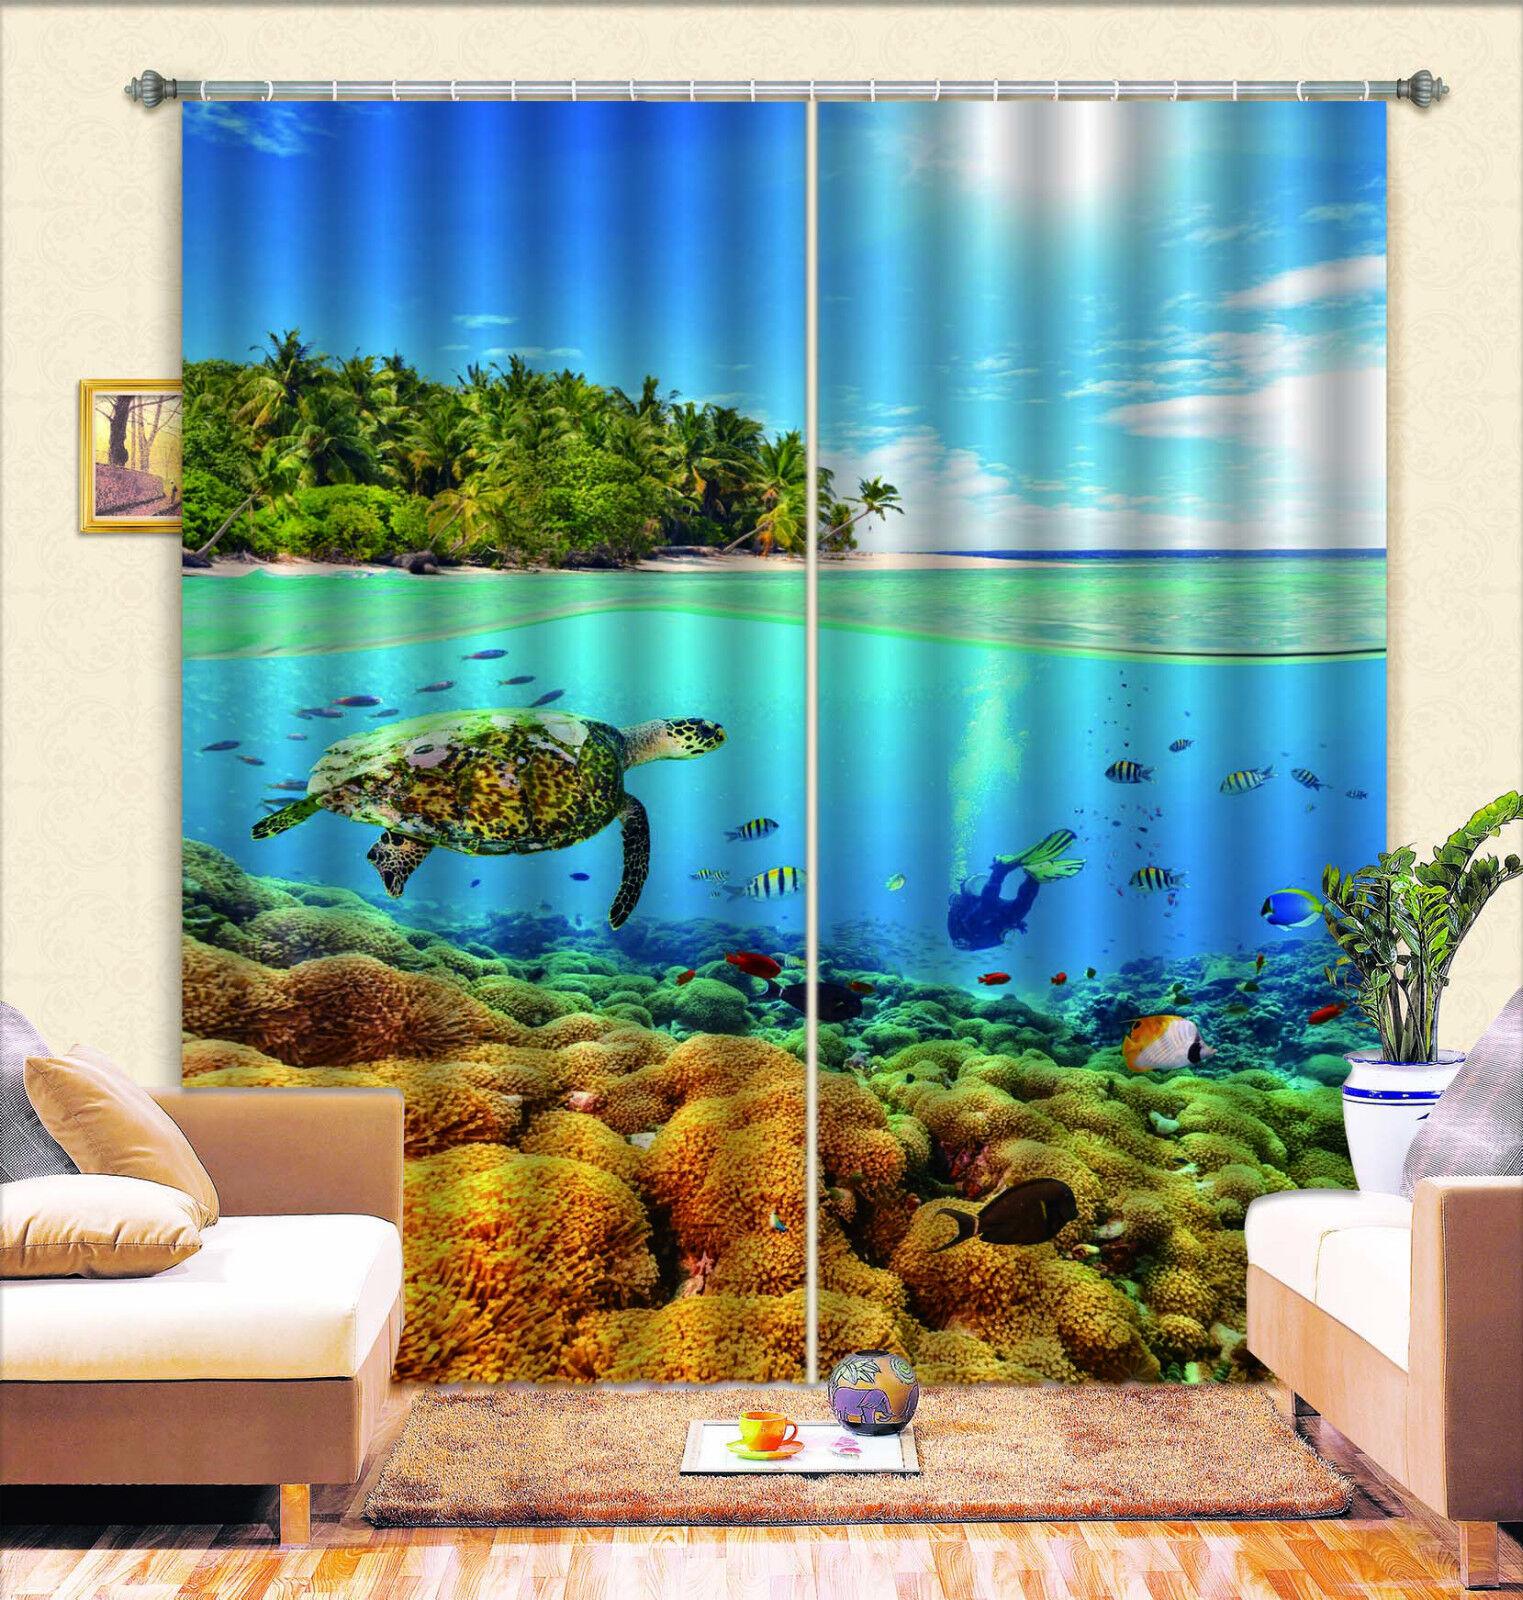 3d bello Oceano 587 blocco foto sipario pressione sipario tende tessuto finestra de